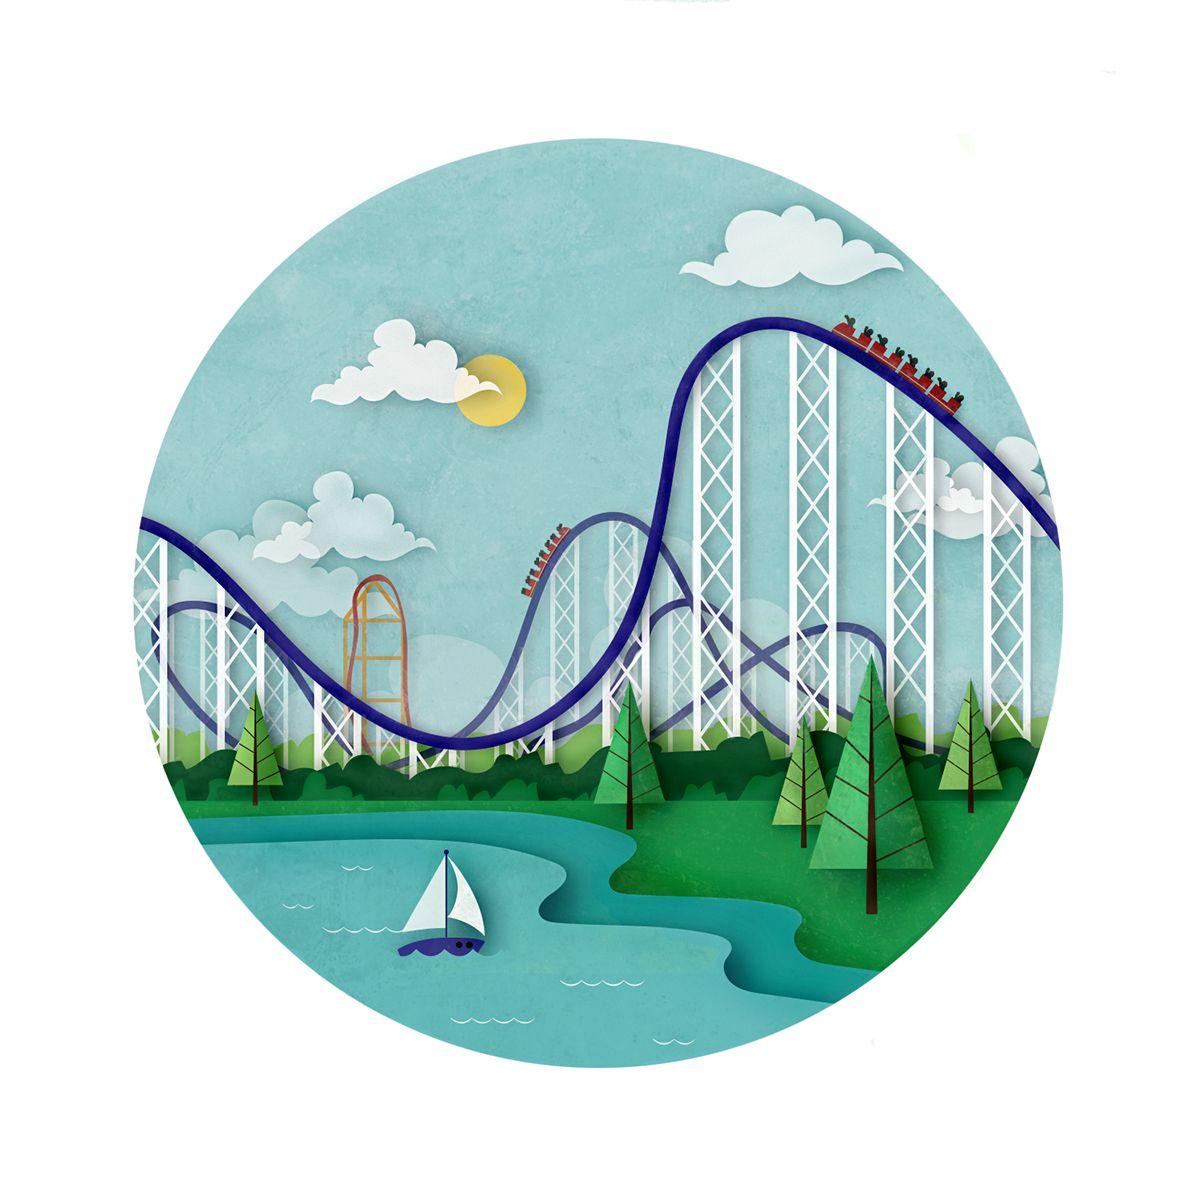 Roller Coaster Spot Illustrations on Behance Roller